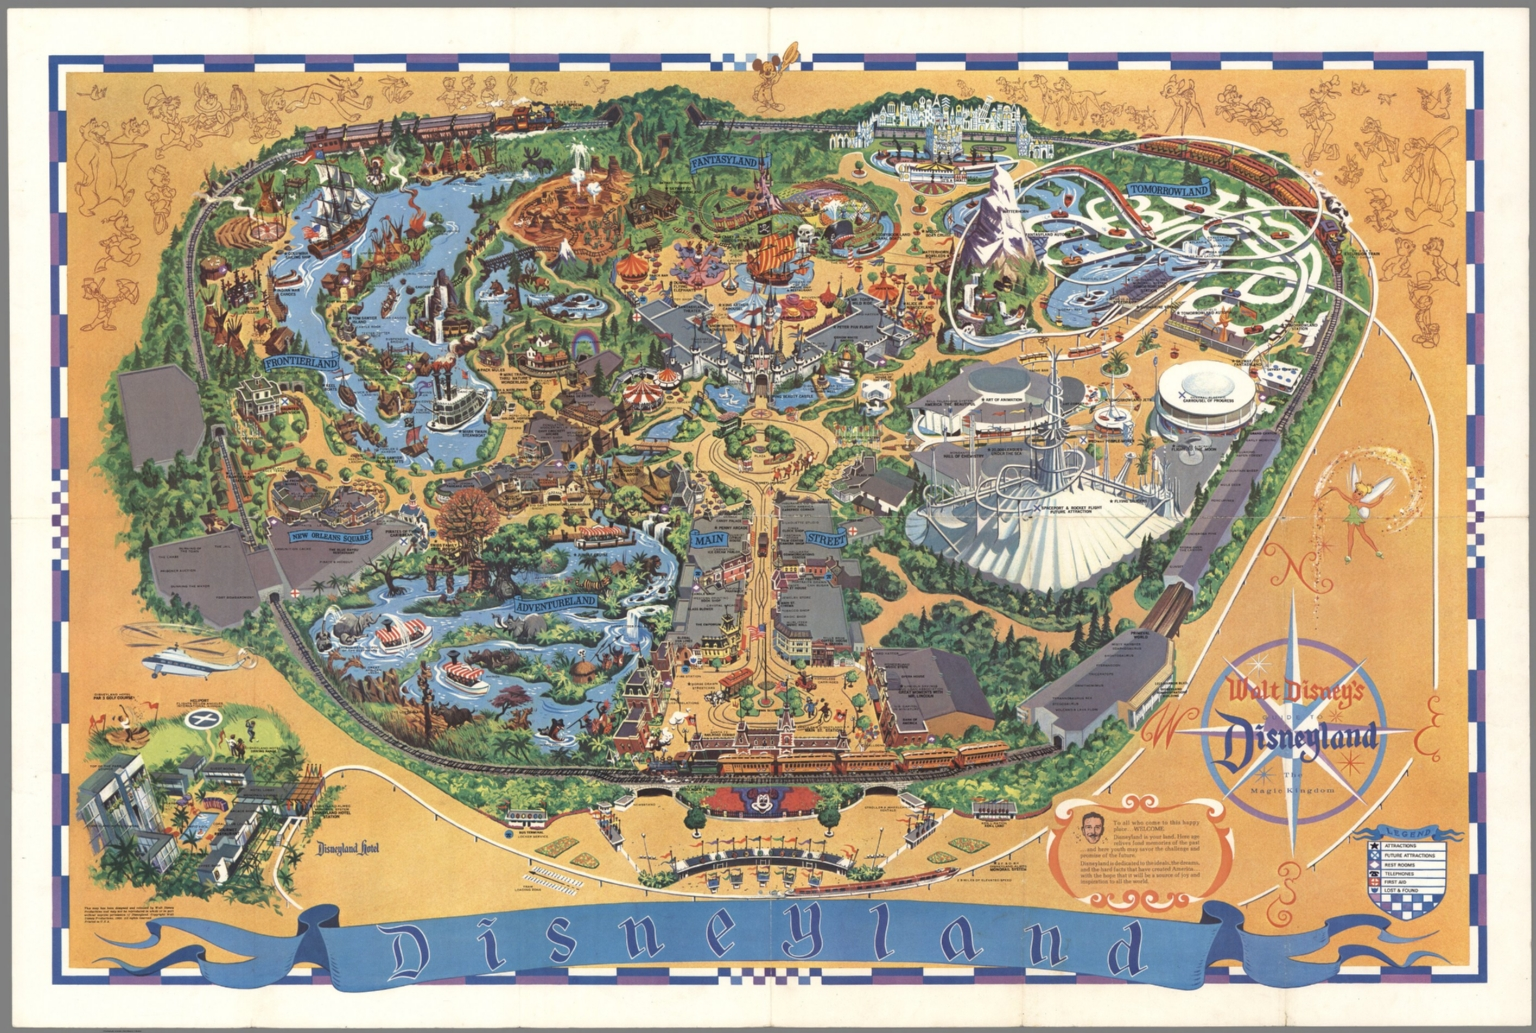 Walt Disney's guide to Disneyland: the magic kingdom.